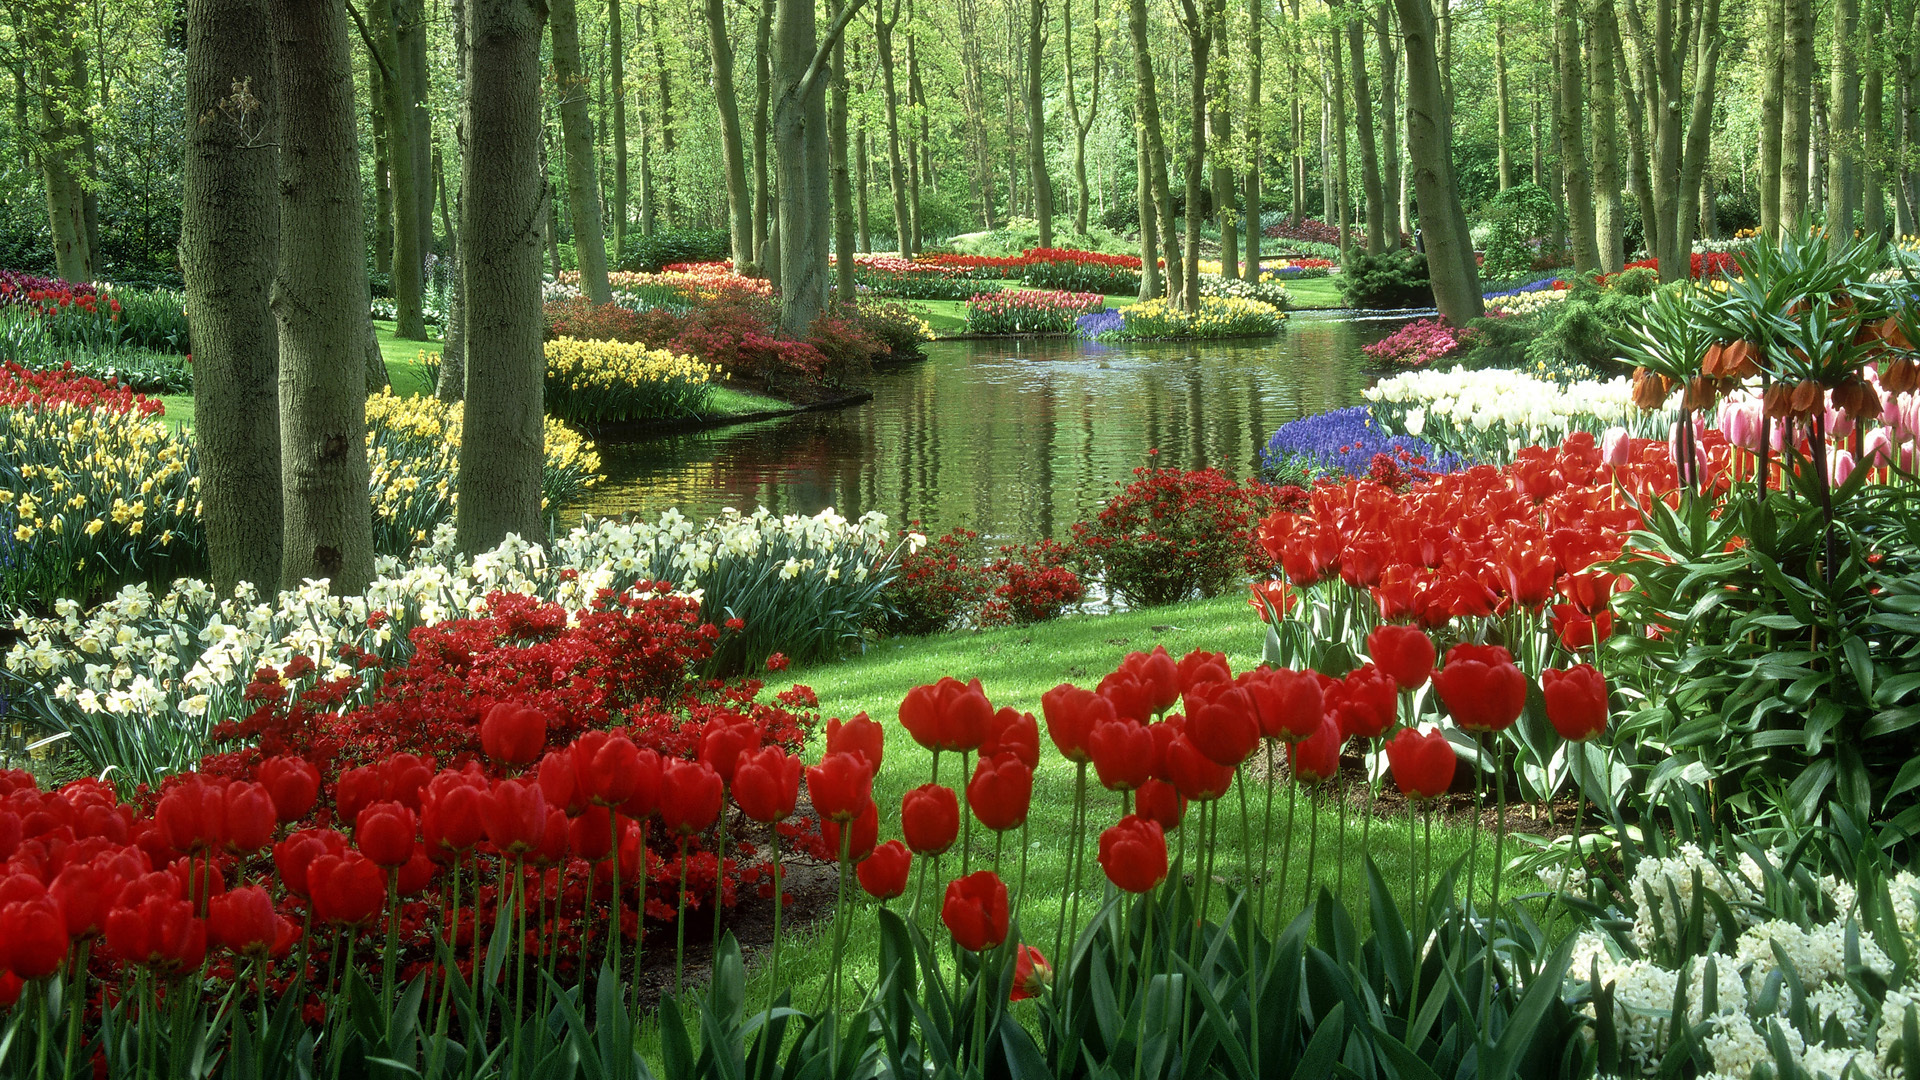 Hd Beautiful Nature Wallpapers Desktop Backgrounds Free Download Donpk